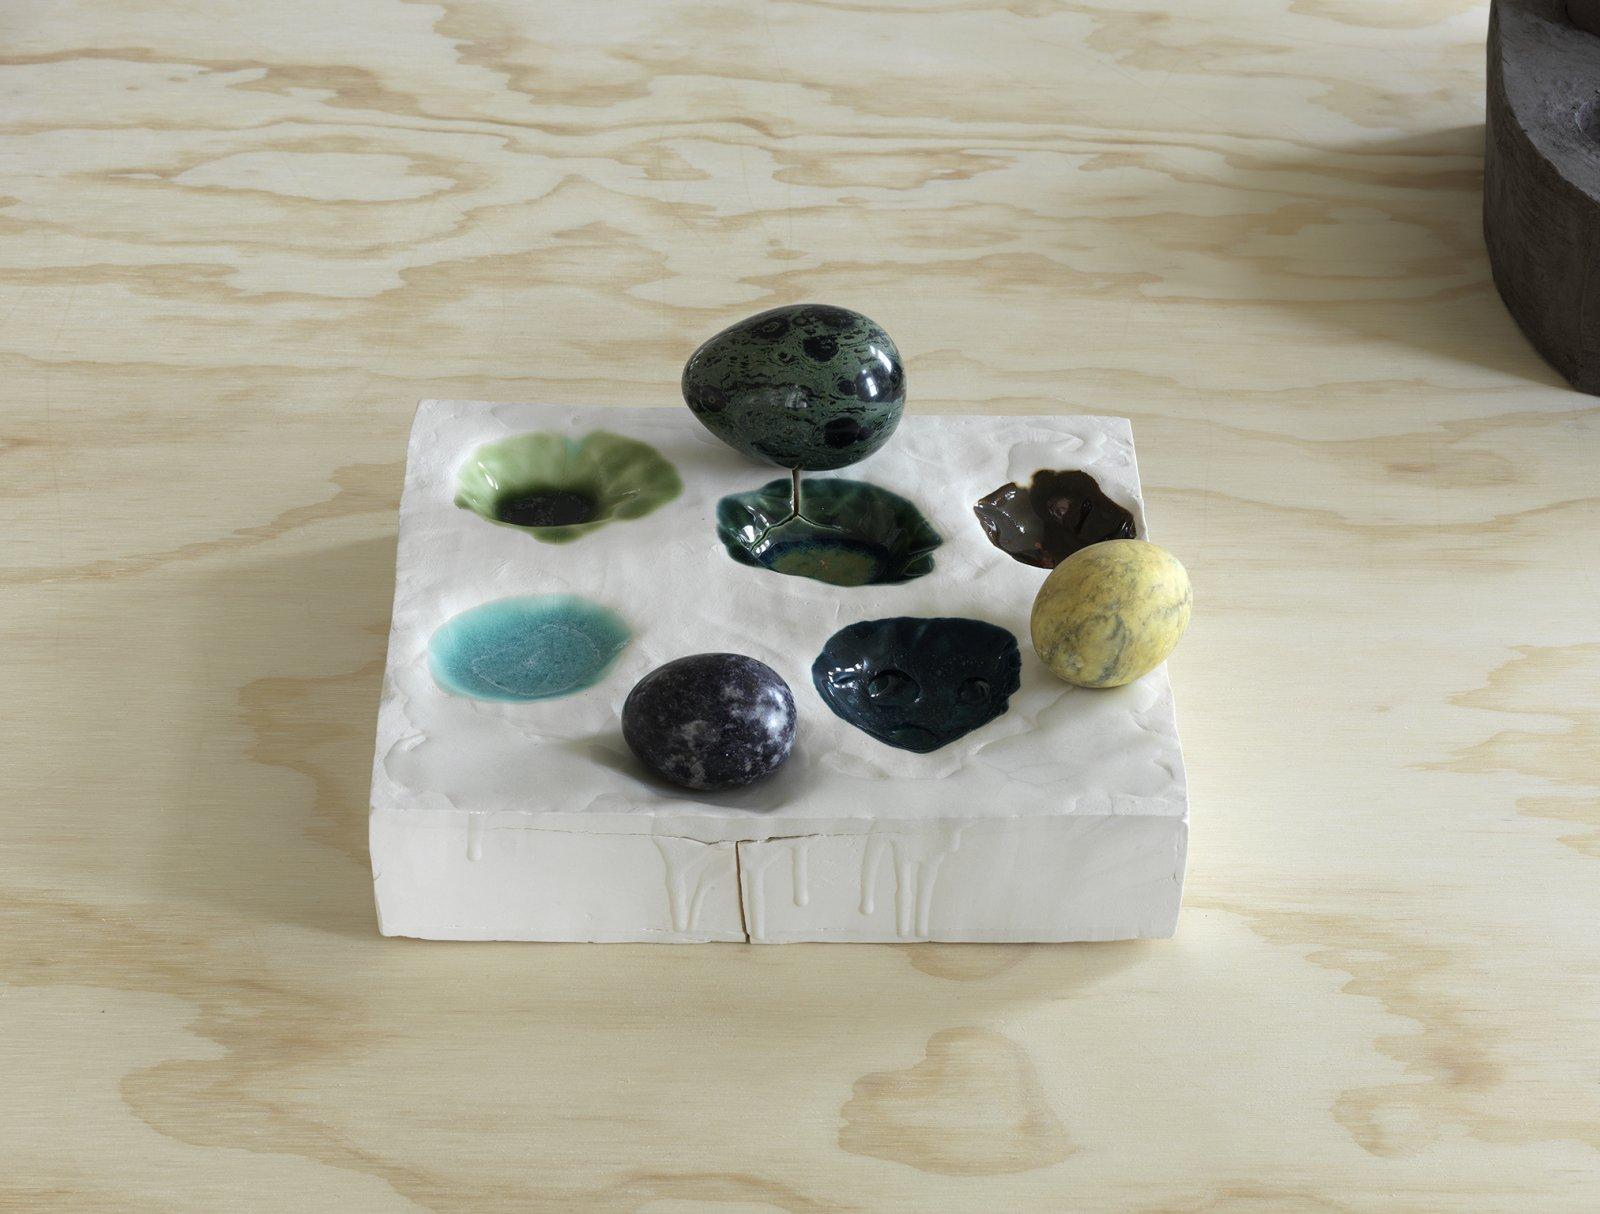 Christina Mackie, Palette no. 5, 2014, porcelain stoneware, orbicular jasper, marble, sodalite, pigment, resin, 8 x 9 x 9 in. (20 x 22 x 24 cm) by Christina Mackie